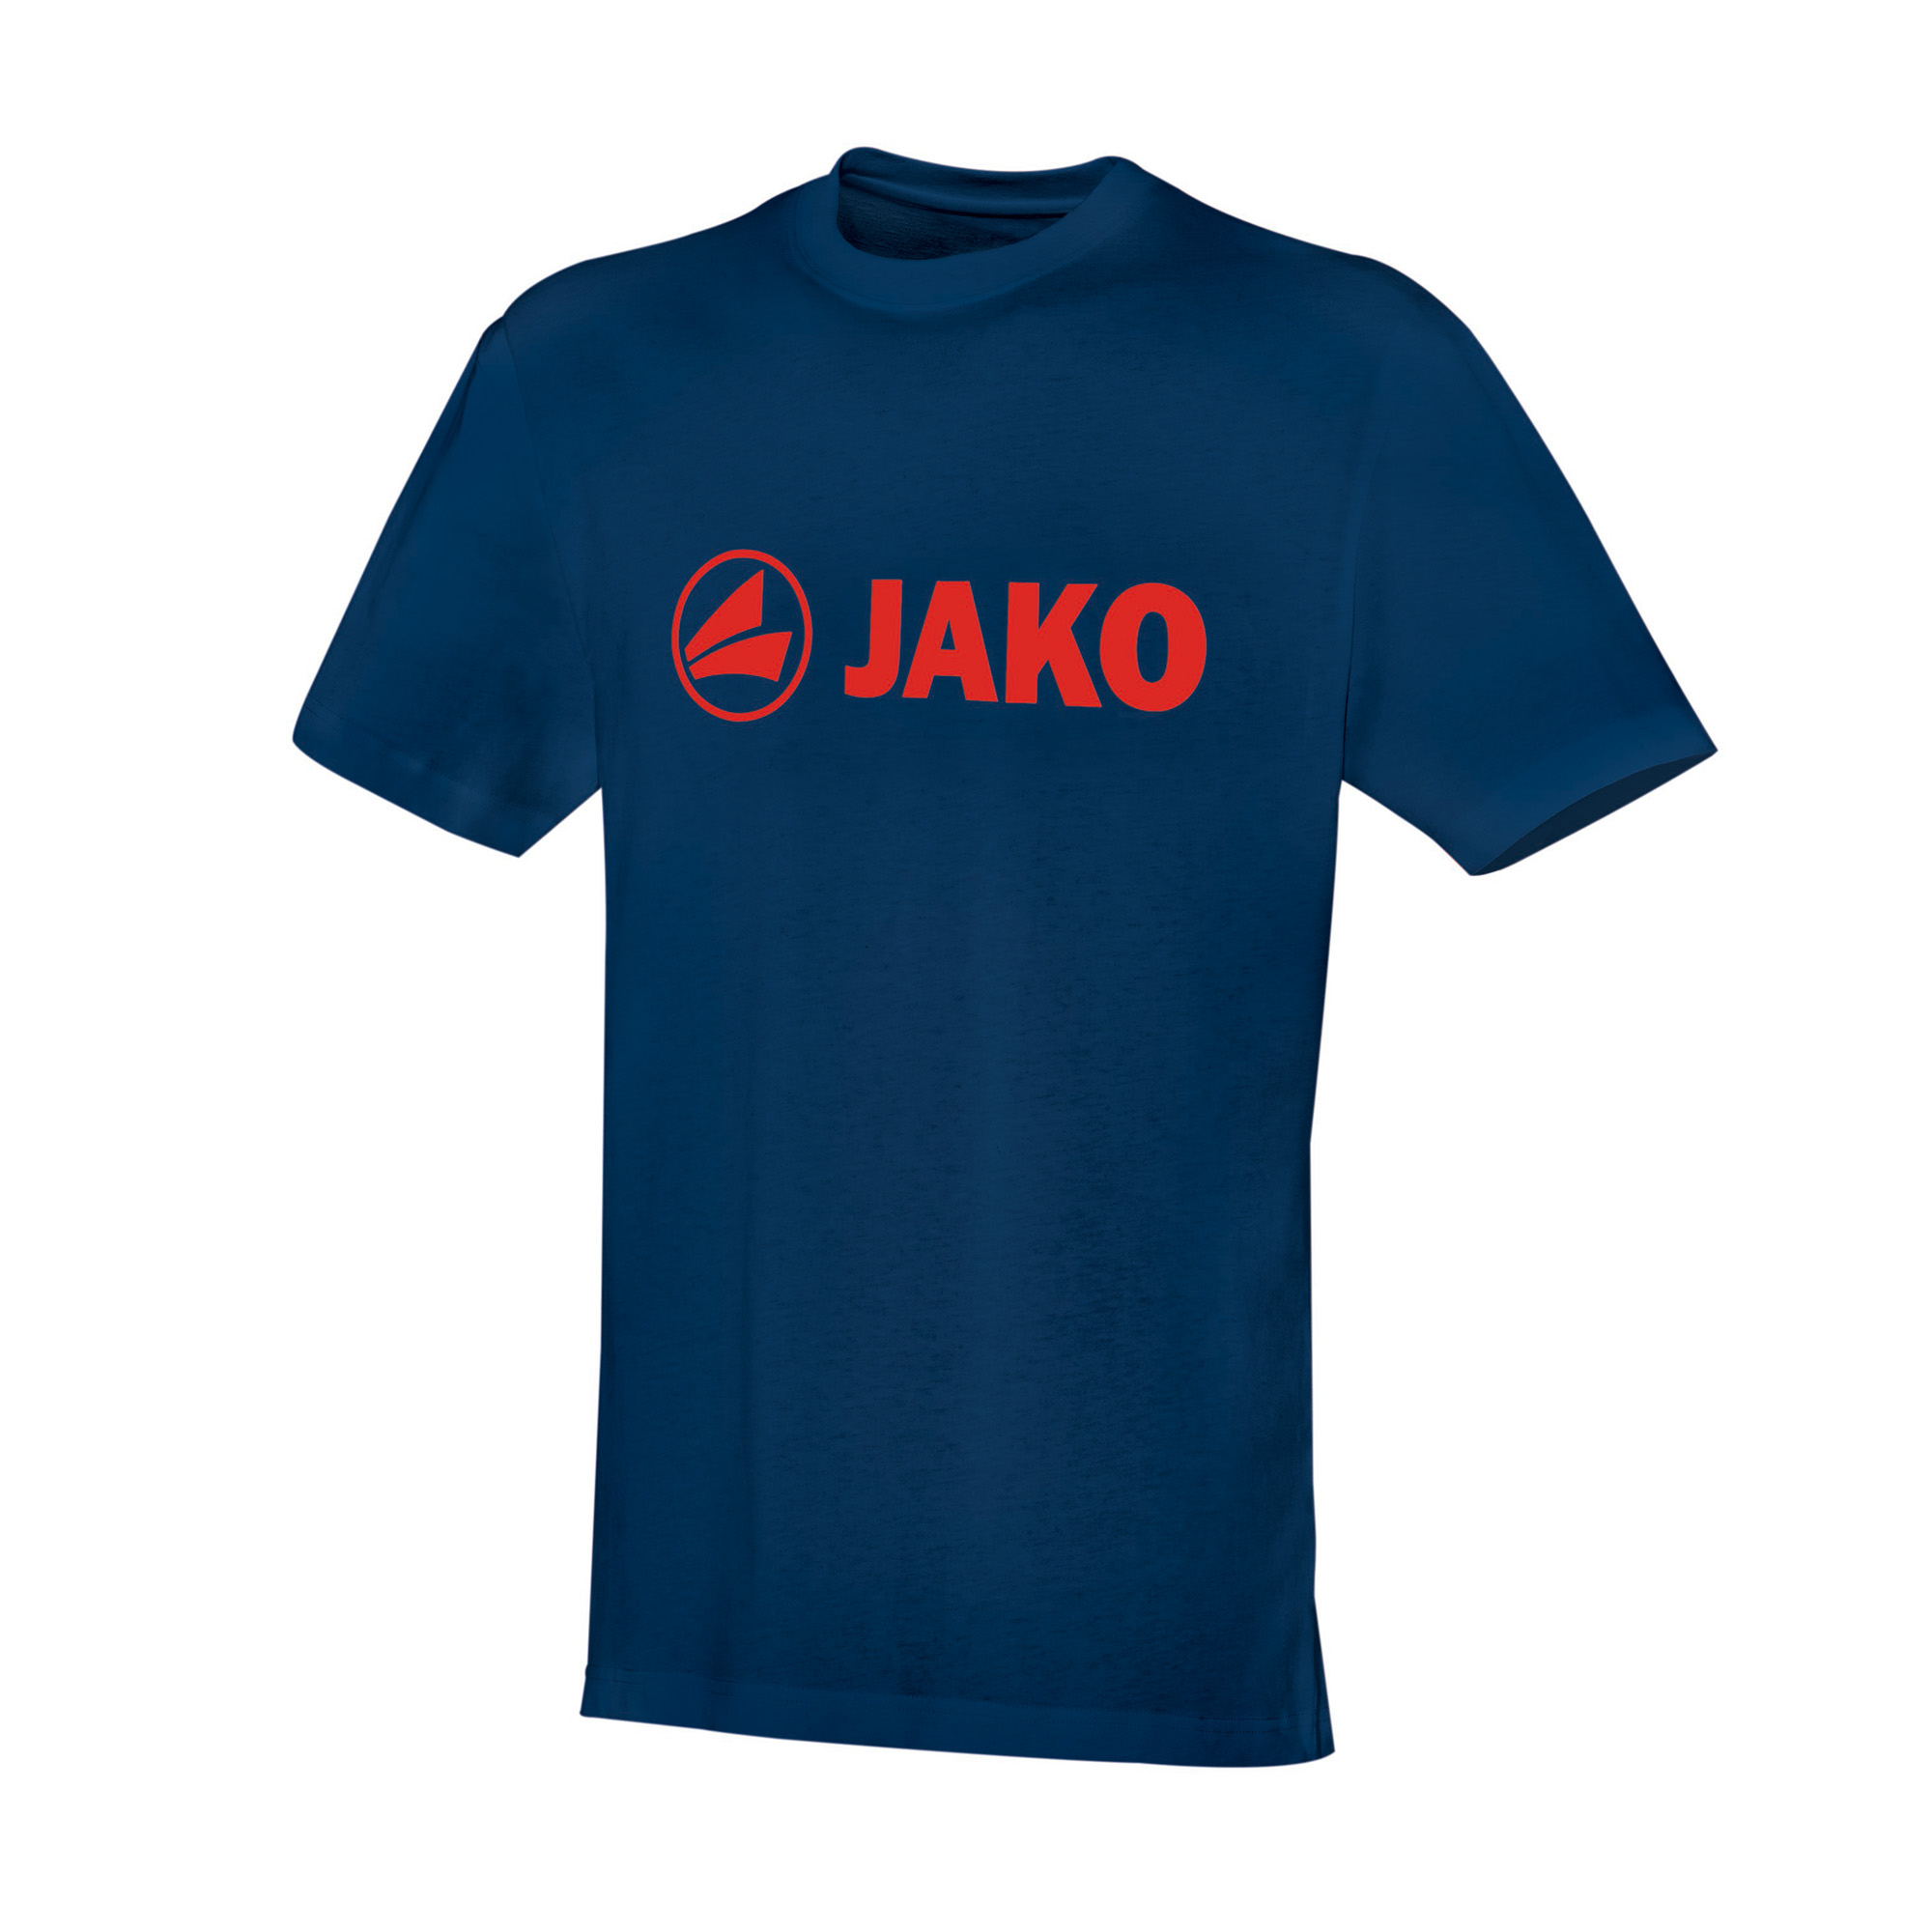 Jako Kinder T-Shirt Promo 6163-18 128